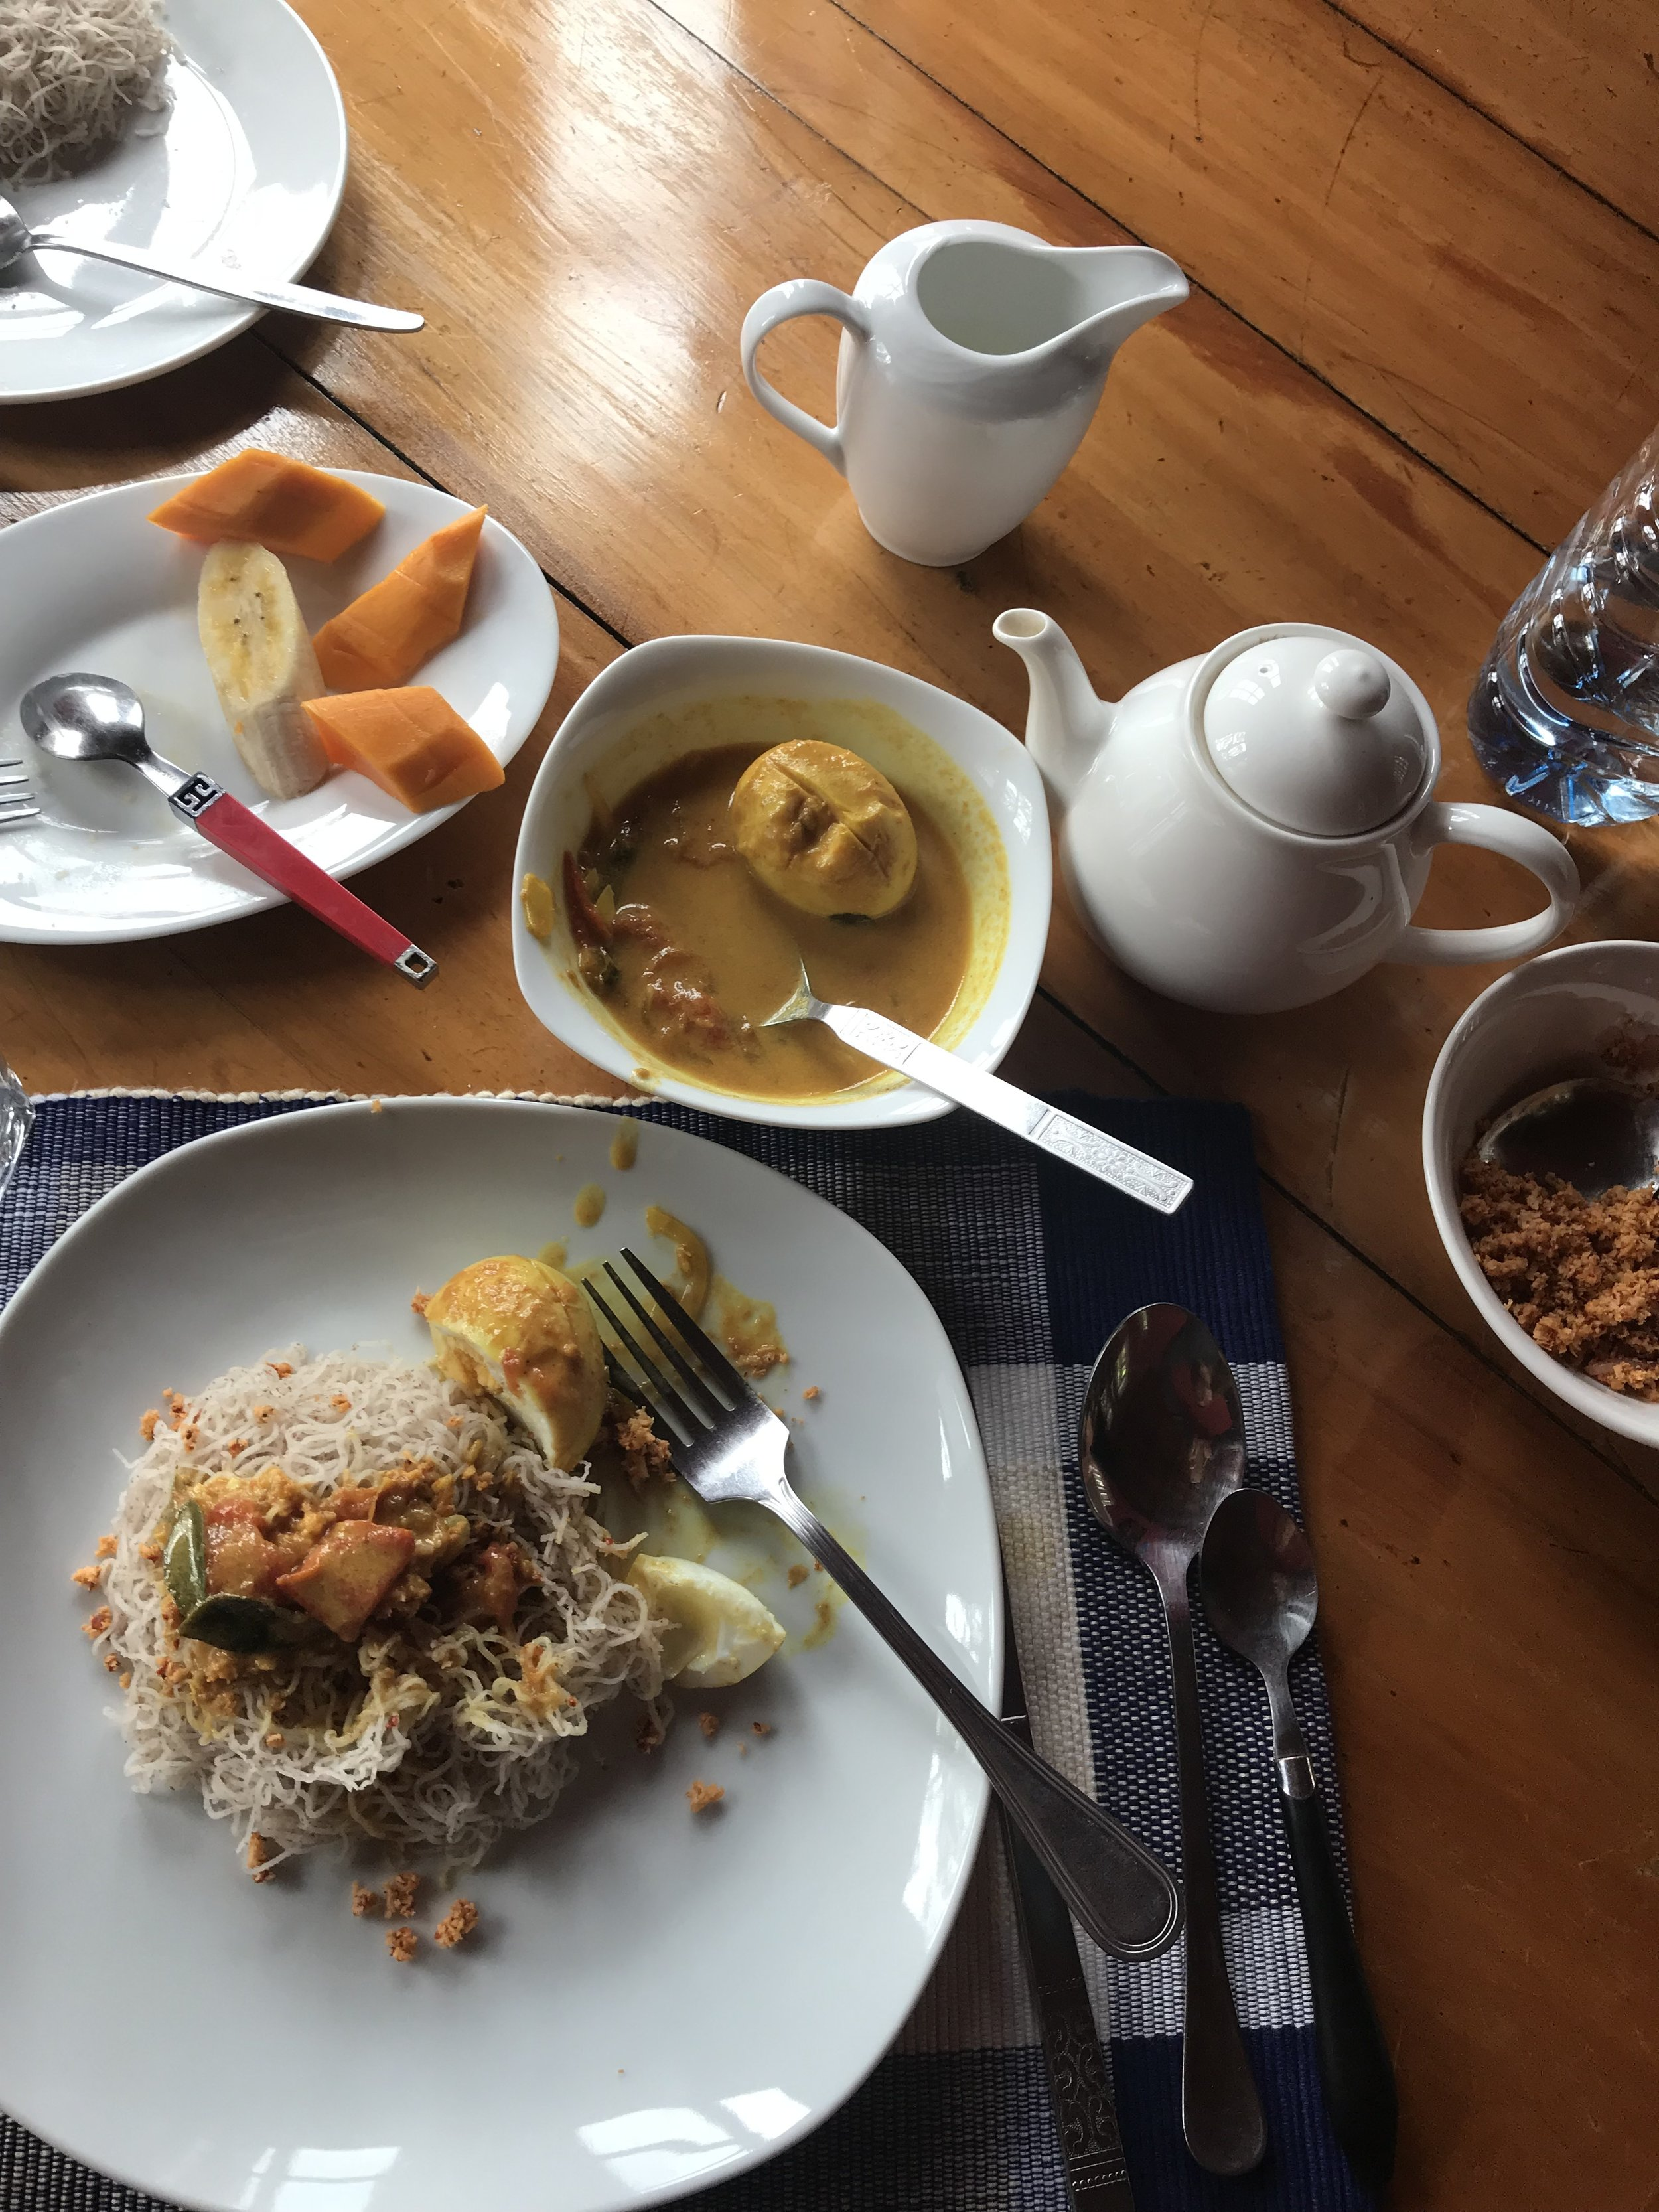 Breakfast provided by my hosts in Nuwara Eliya: string hoppers, curried eggs, fresh fruit and coffee